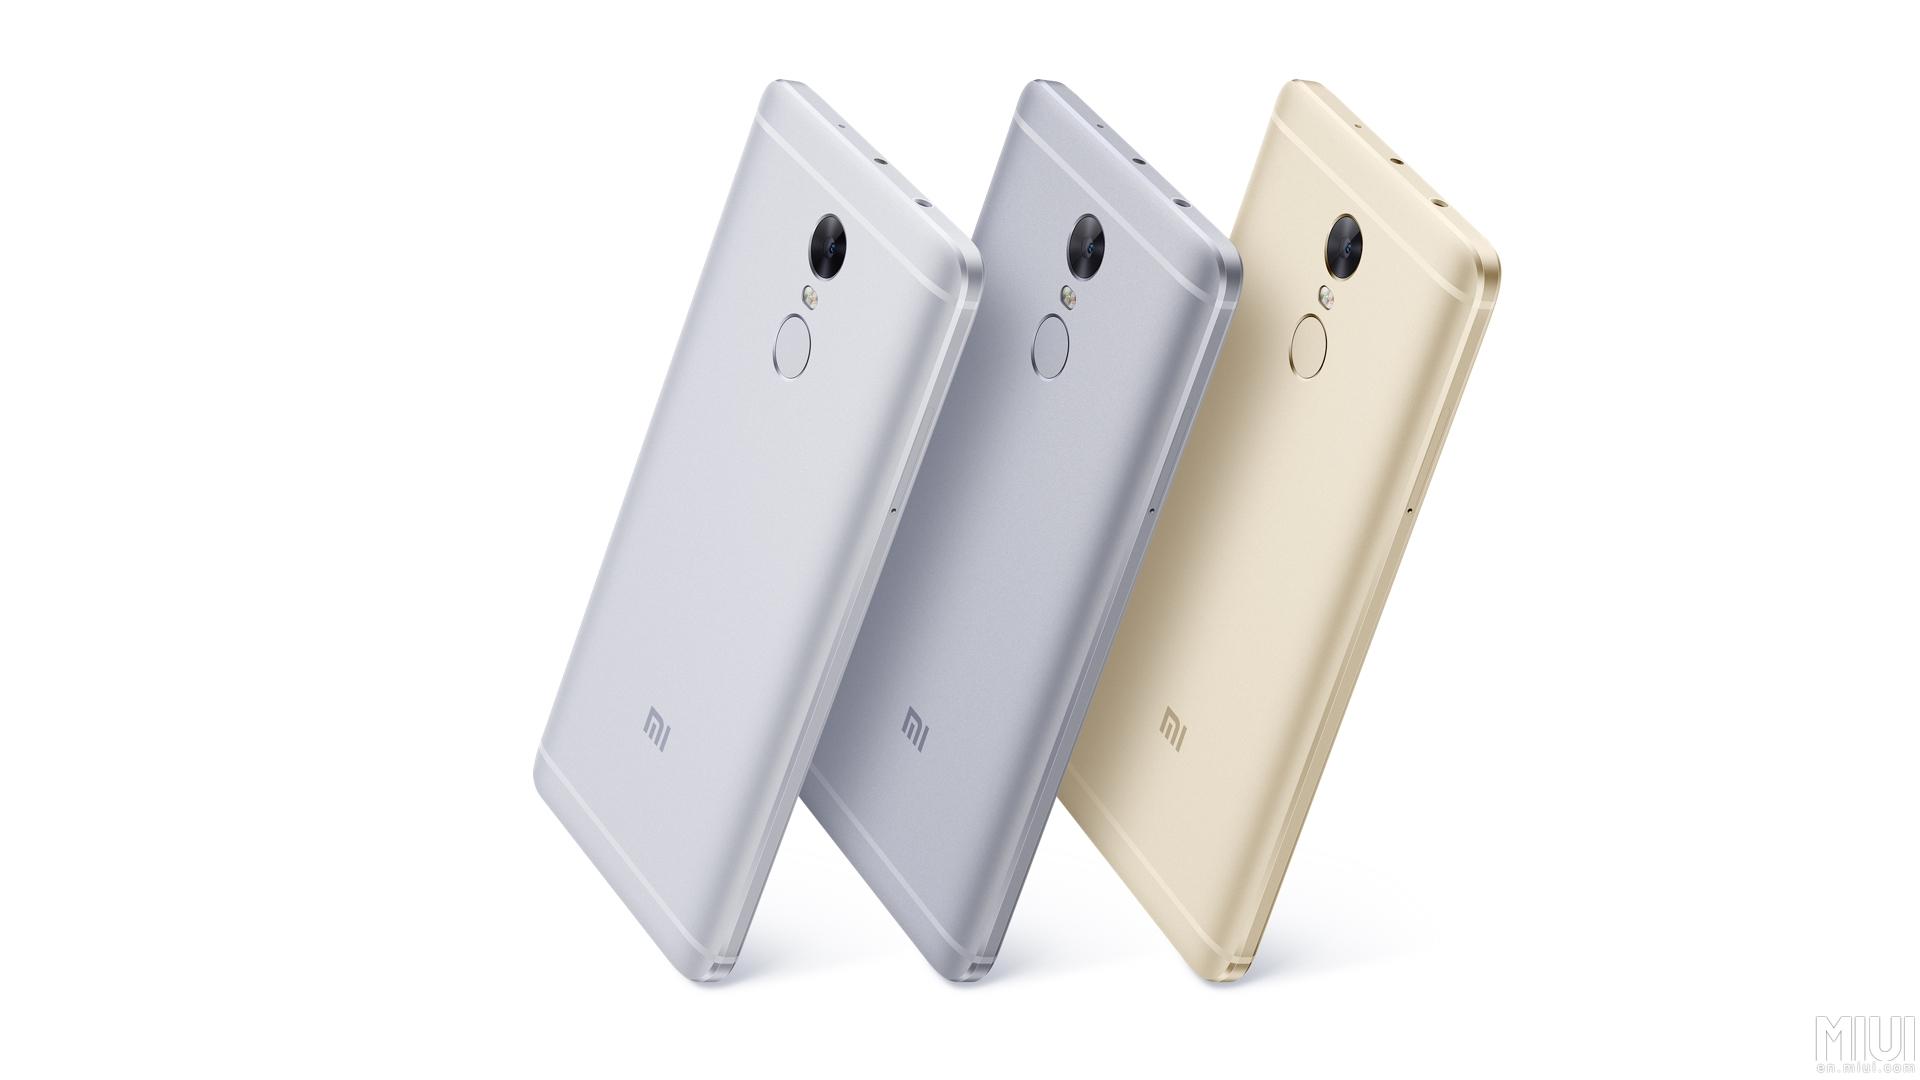 Quick Facts About Xiaomi Redmi Note 4: Xiaomi Redmi Note 4 : Un Smartphone Décacore Avec Une